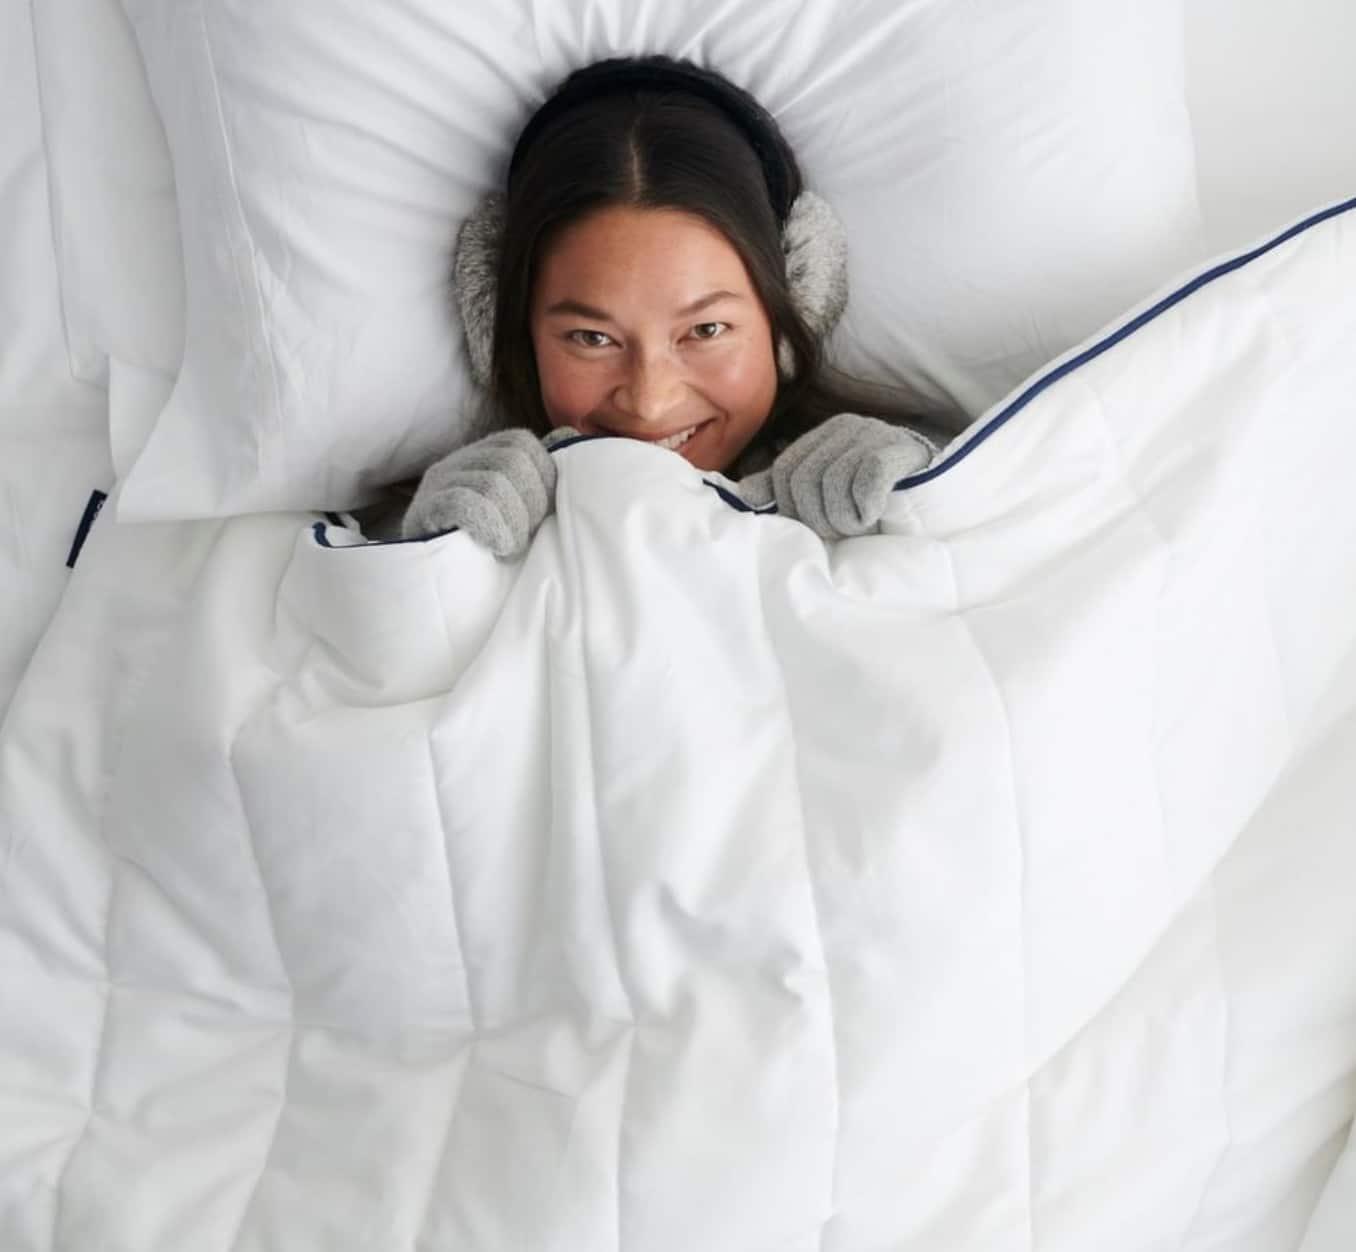 bearaby weighted blanket sleeps cool